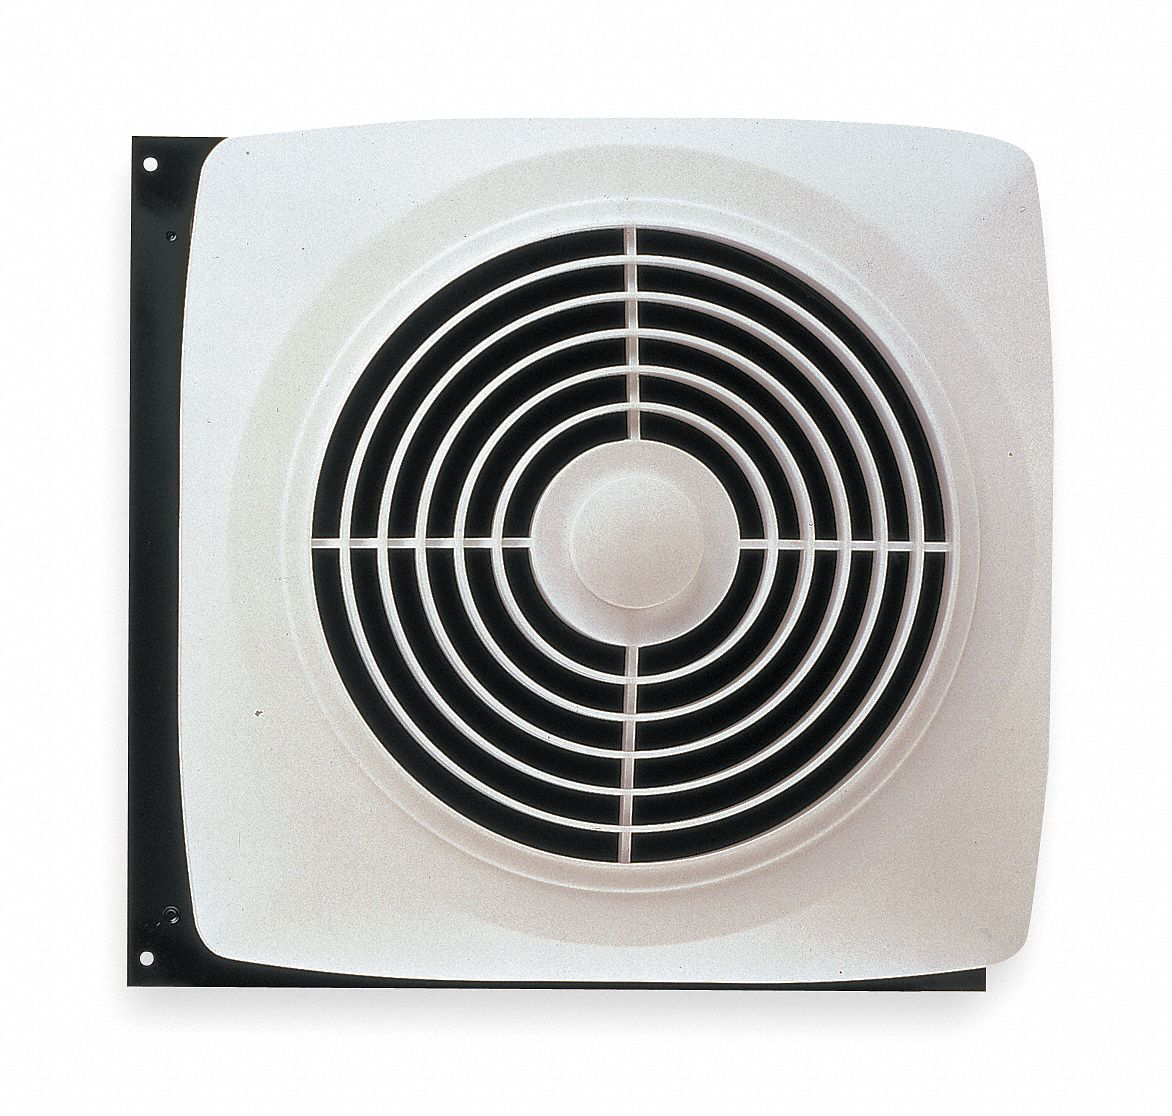 exhaust fan through the wall steel adj 4 1 2 to 9 1 2 in housing length in